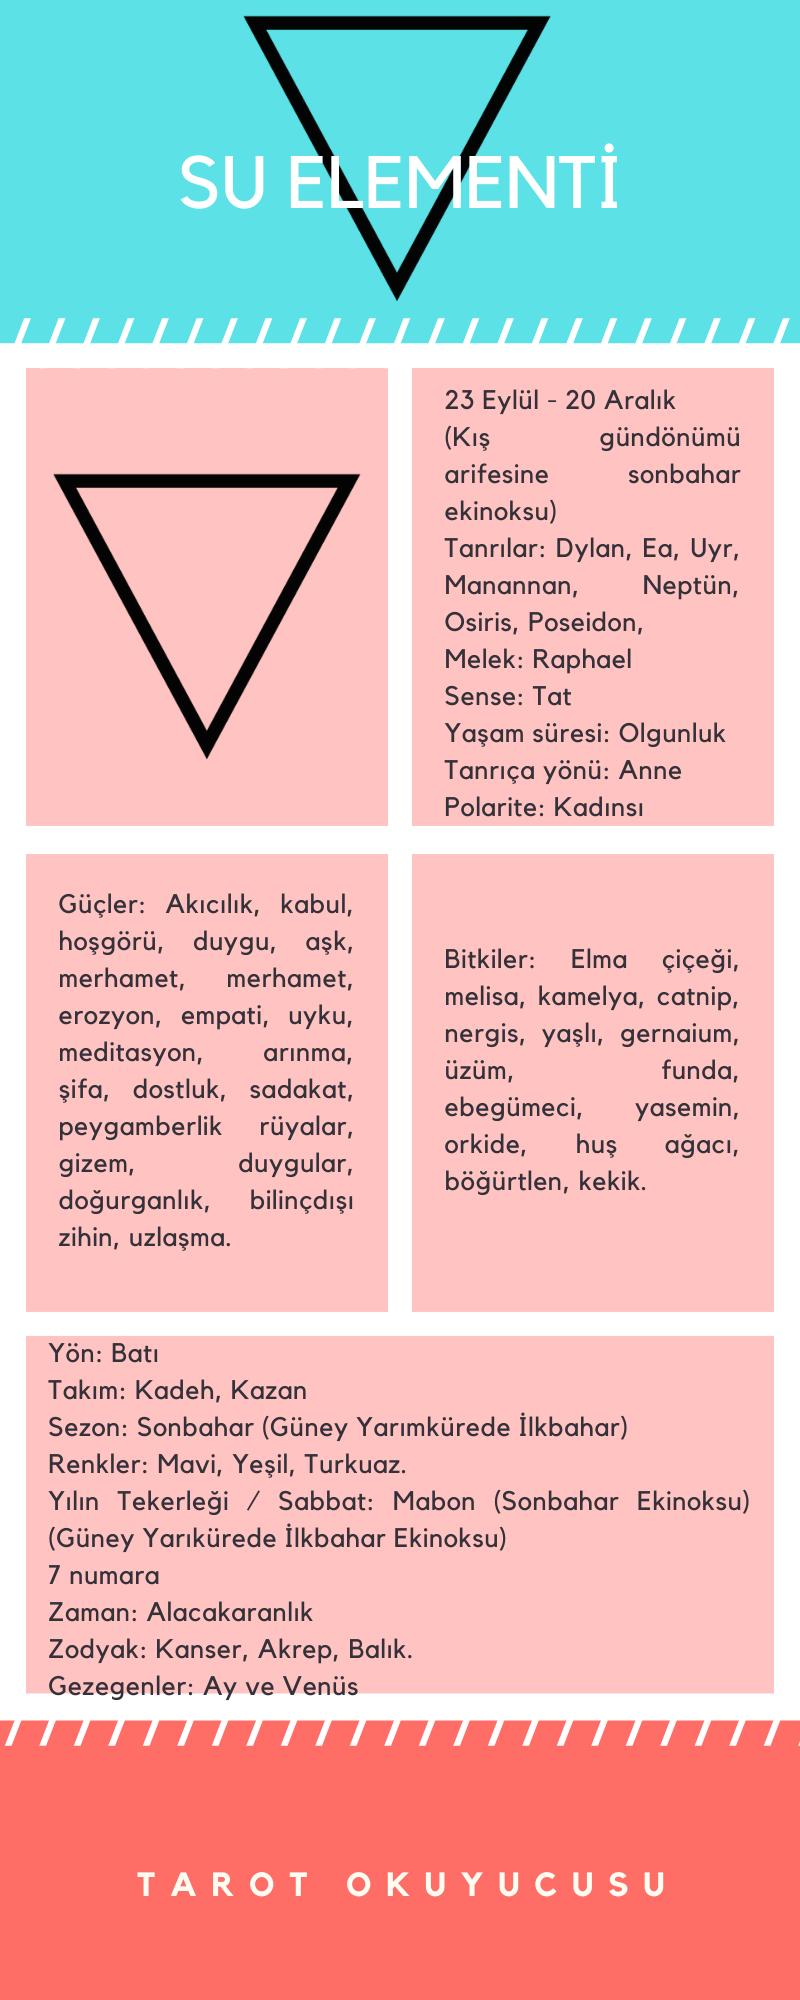 YENGEÇ - AKREP - BALIK SU ELEMENTİ DETAYLI ANALİZİ TAROT OKUYUCUSU